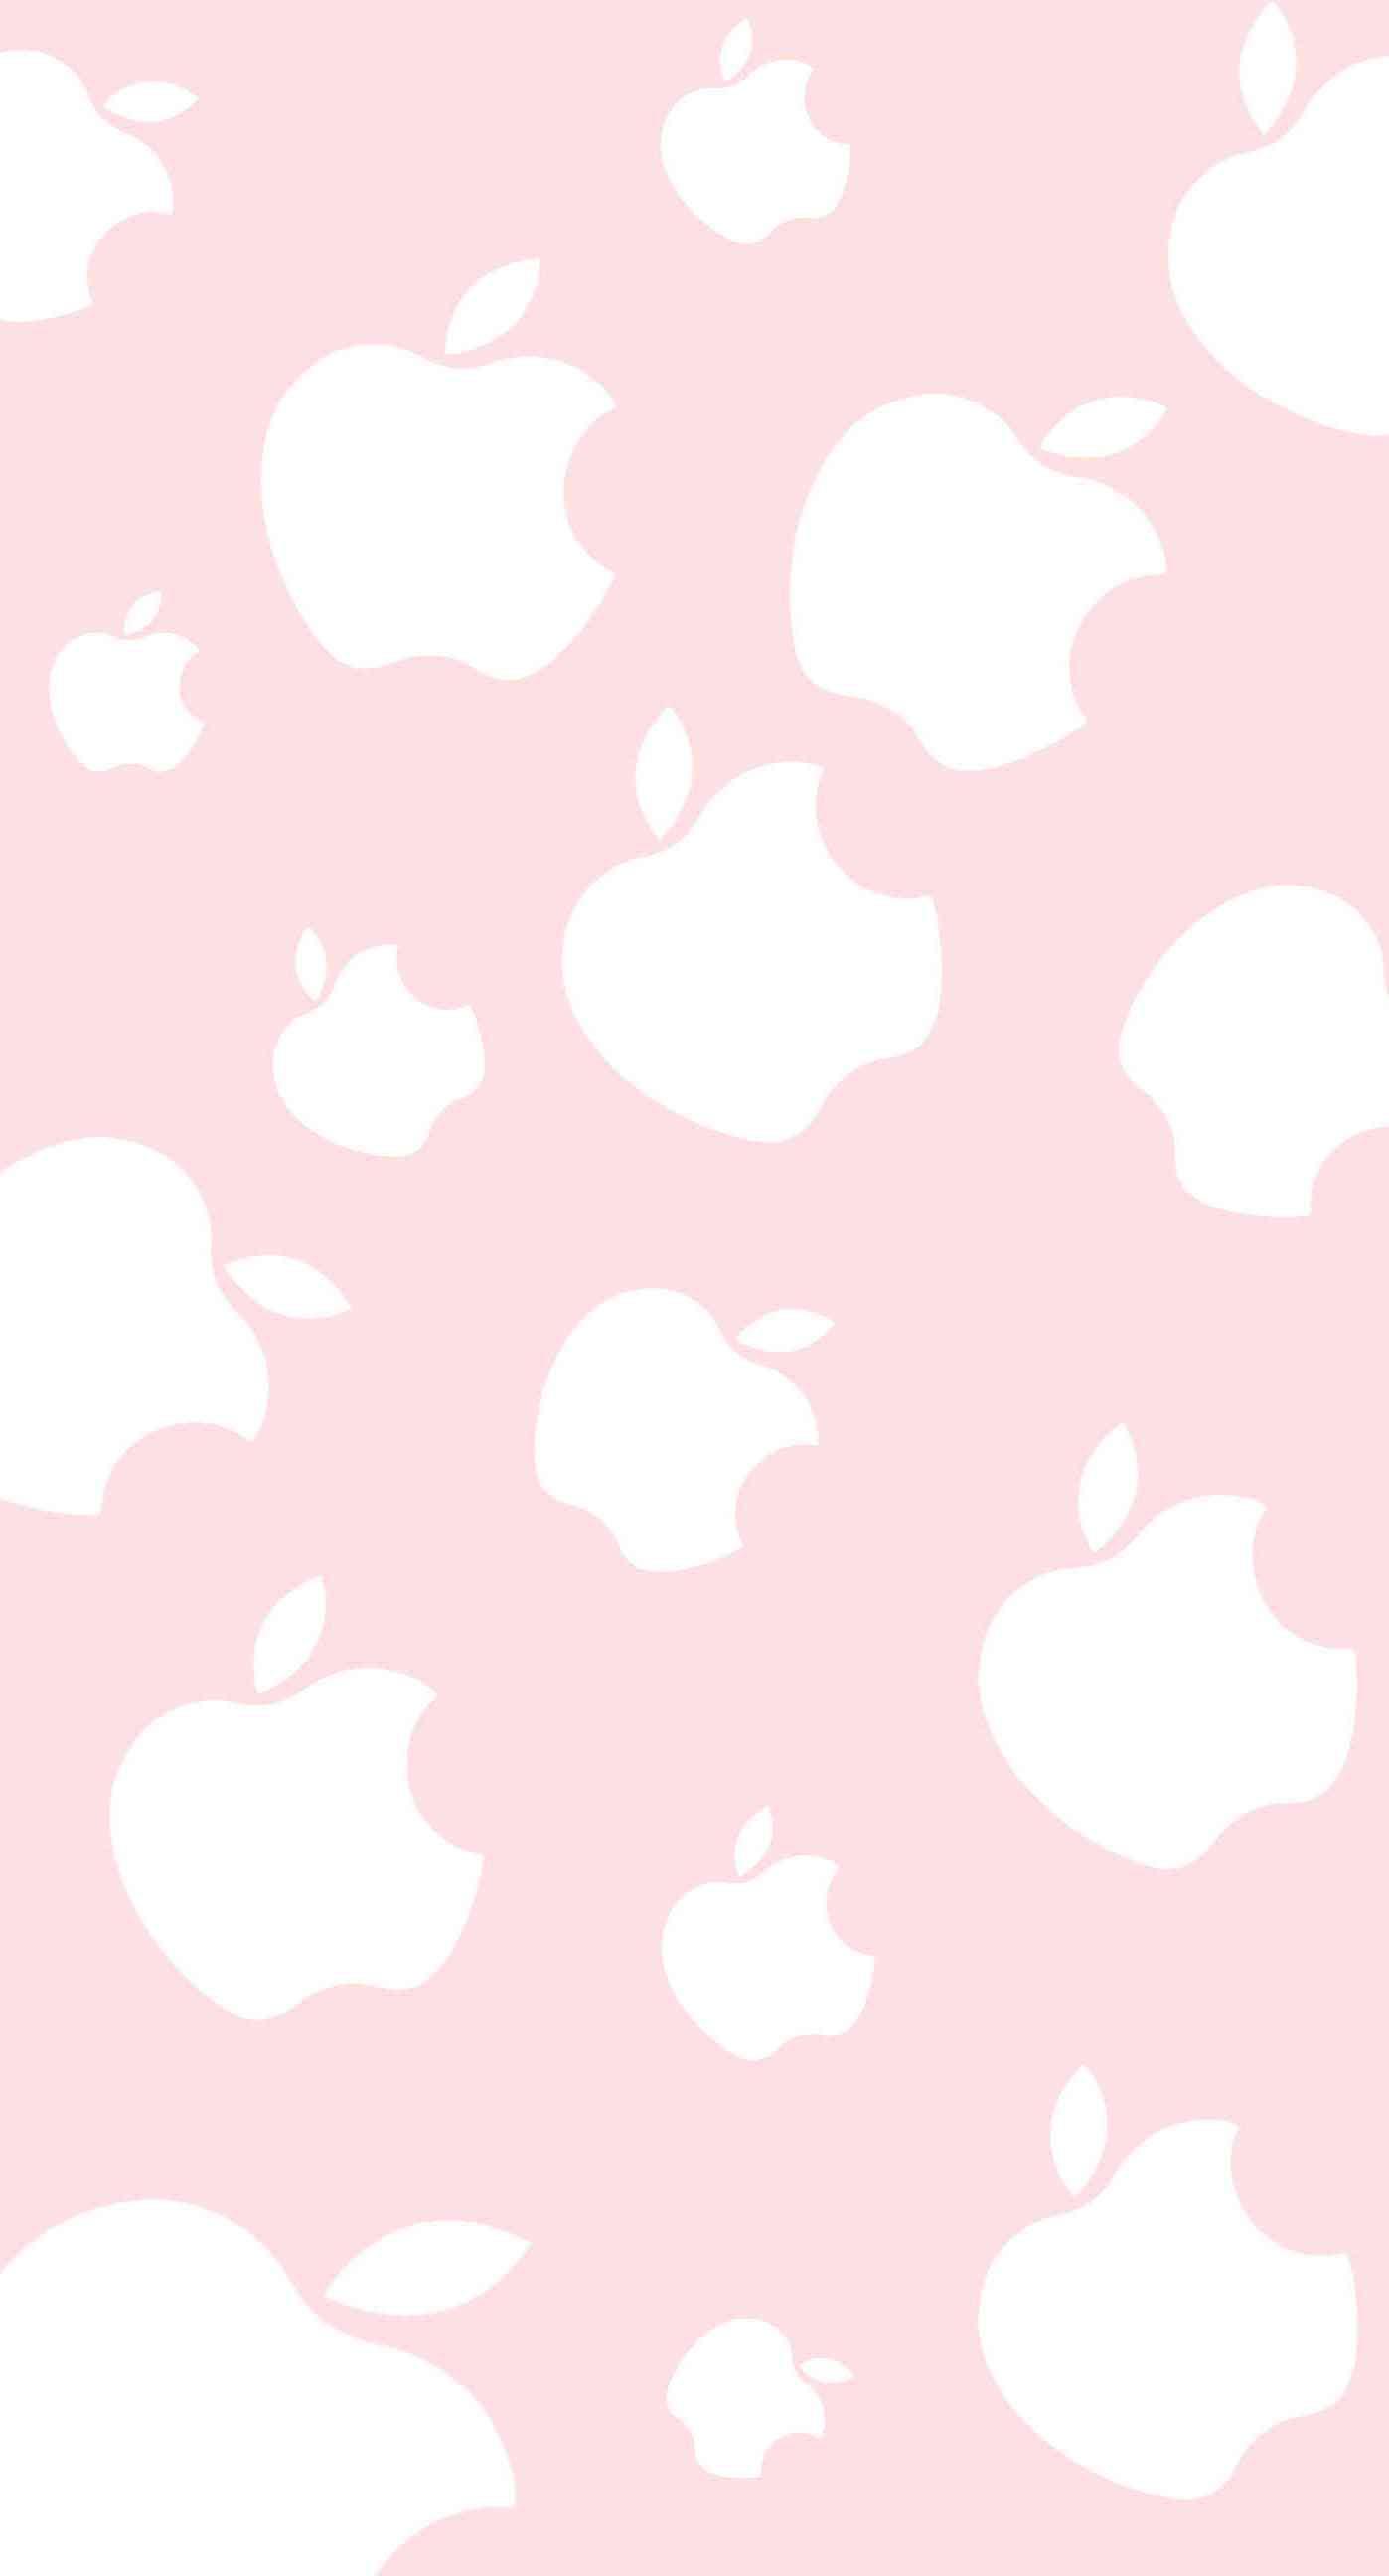 Cute Apple Peach Wallpaper Sc Iphone7plus